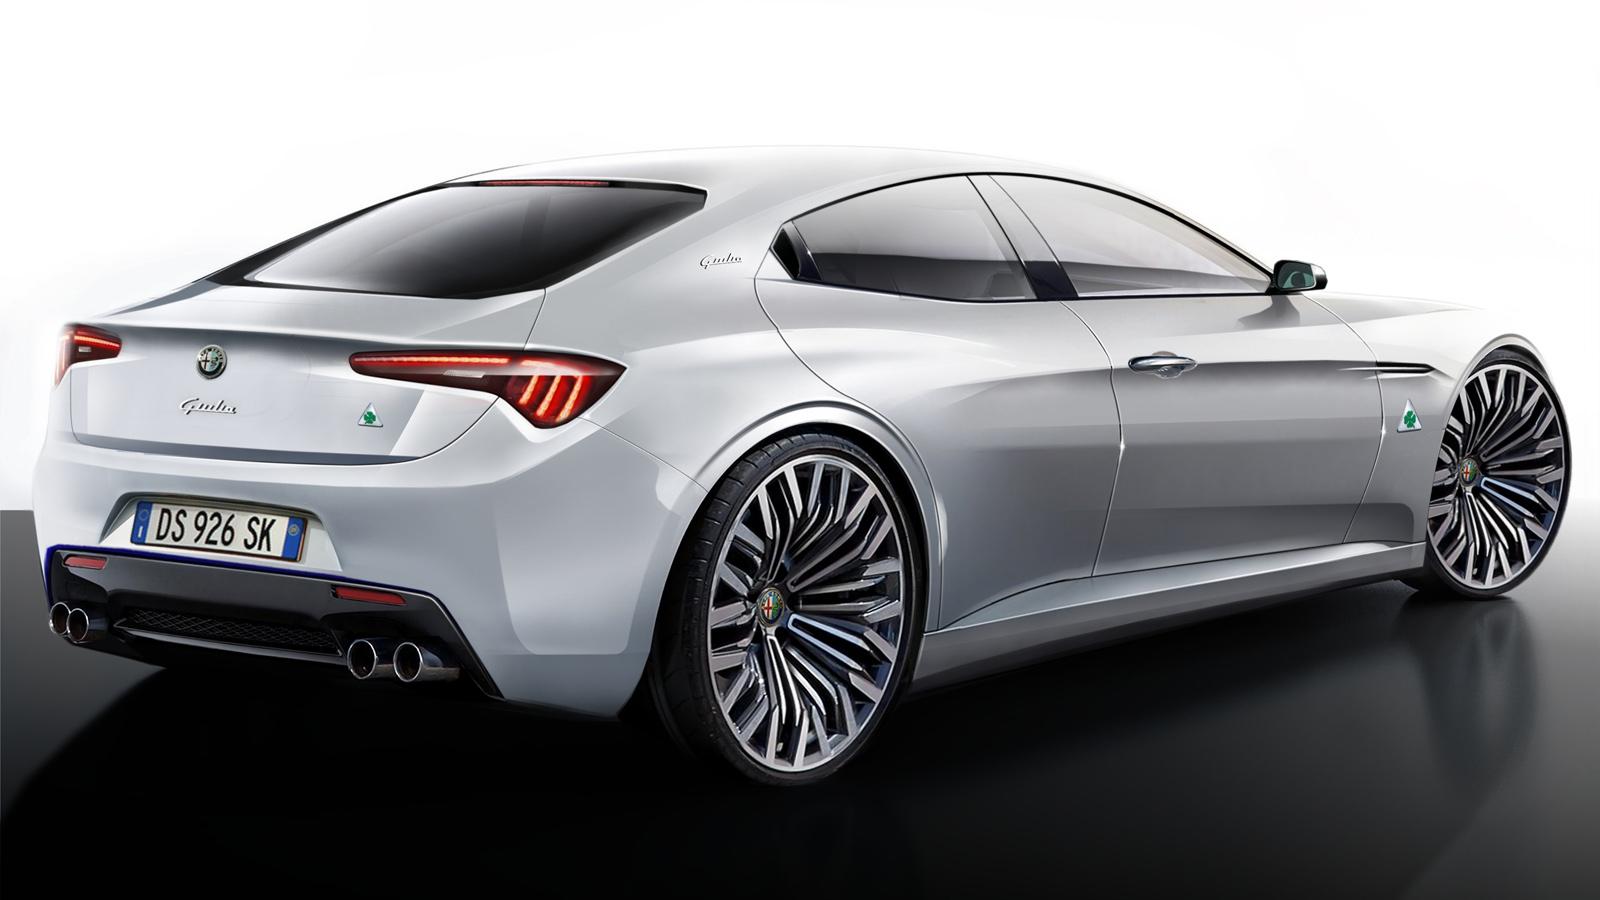 2015-Alfa-Romeo-Giulia-Launches-First-Among-9-New-Alfas-4